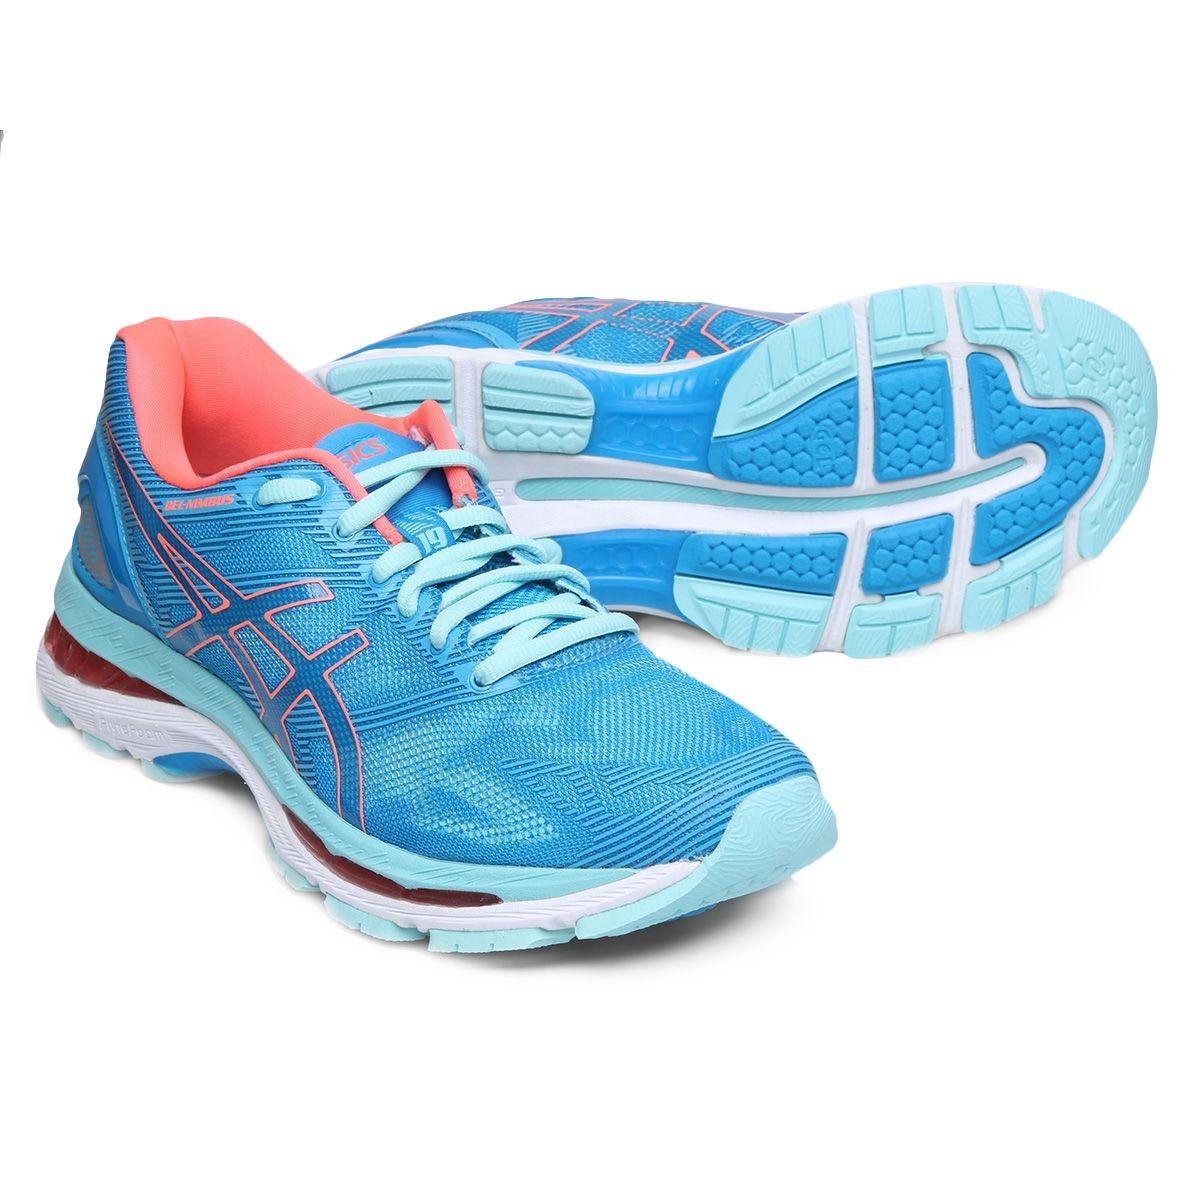 d29c310191e tênis asics gel nimbus 19 feminino - azul. Carregando zoom.